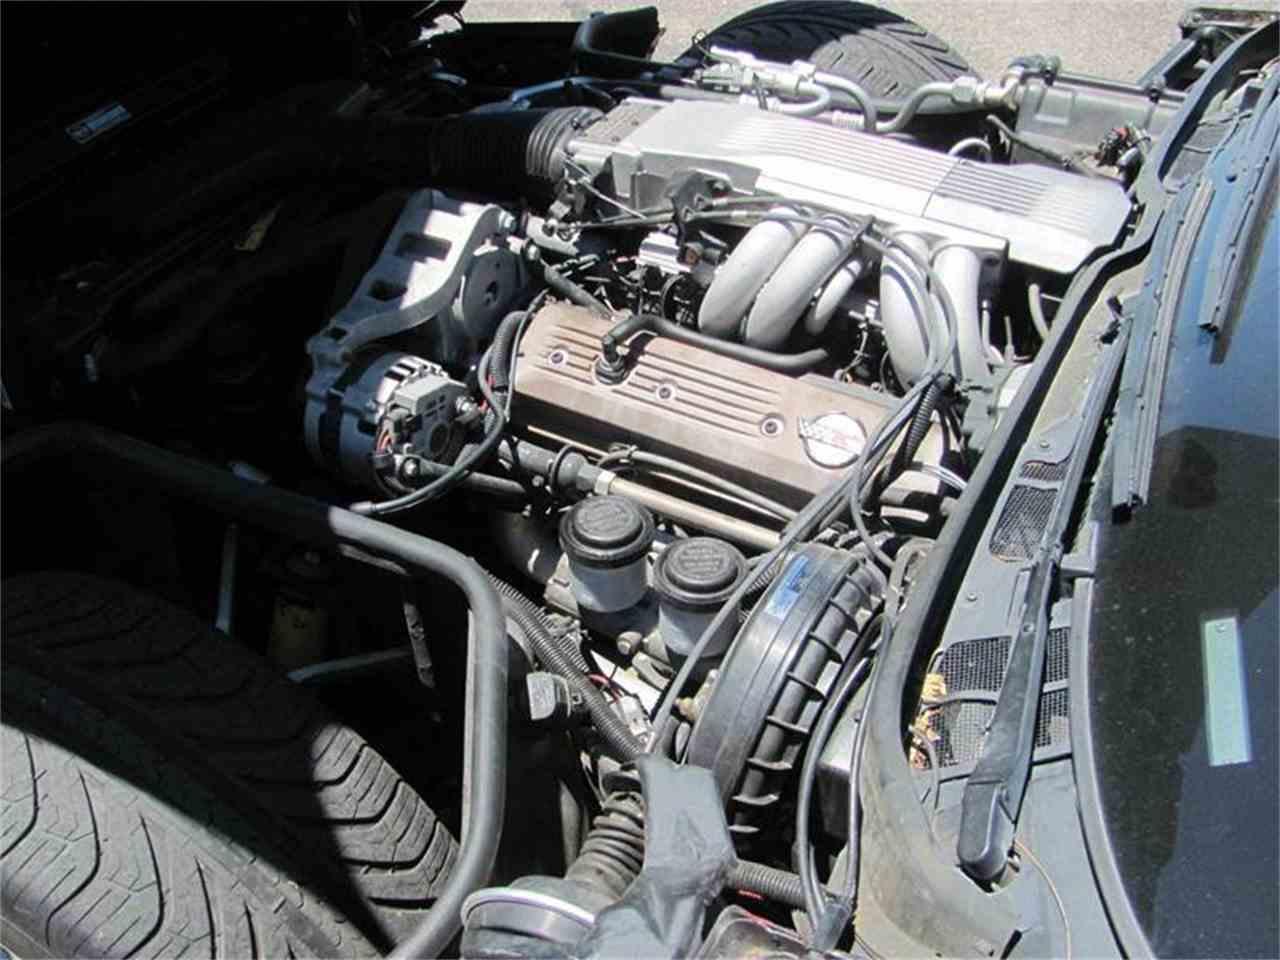 Large Picture of '88 Chevrolet Corvette located in Arizona - $9,995.00 - IWXM